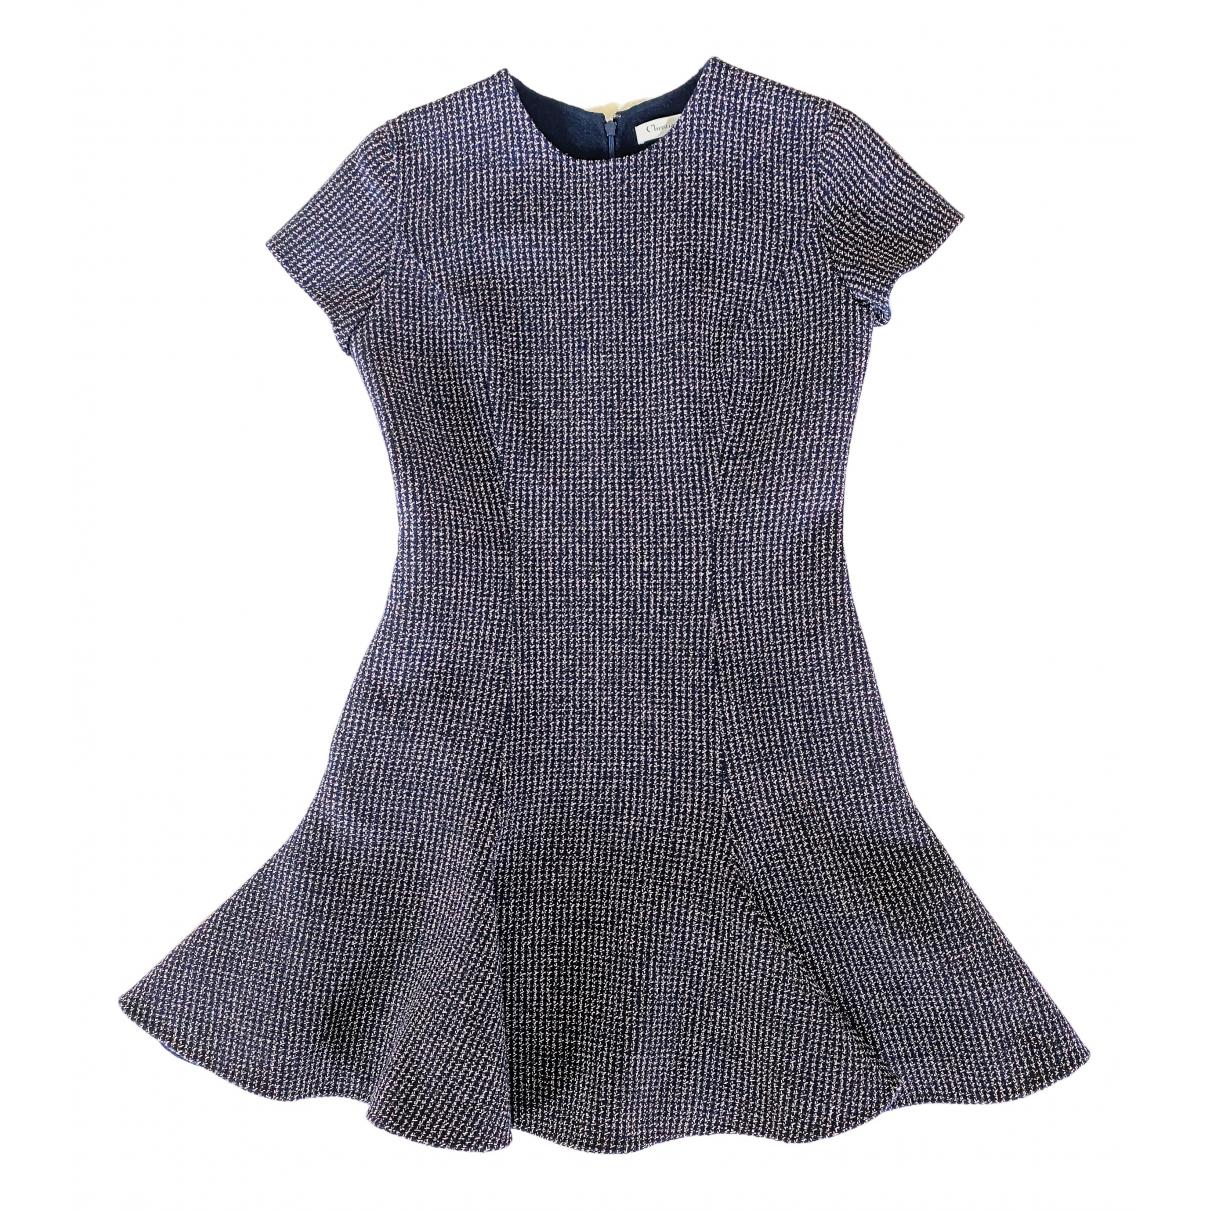 Dior N Navy Wool dress for Women 40 FR